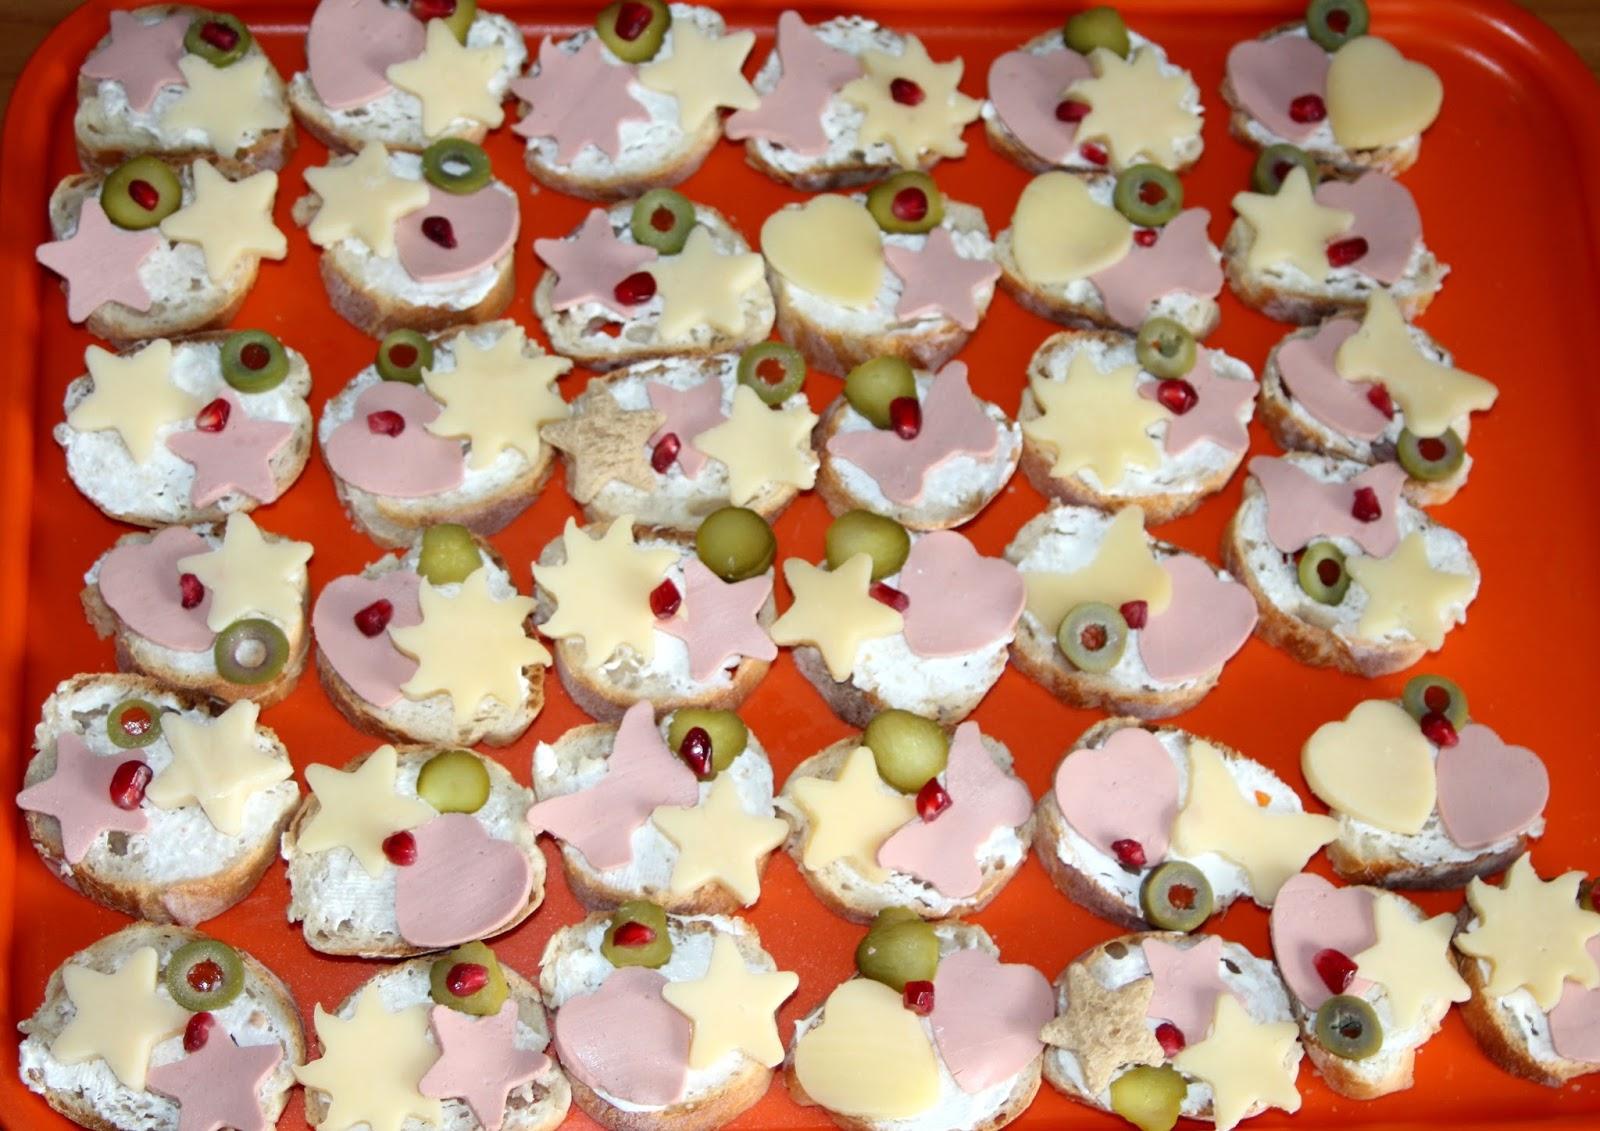 sendviči za rođendan Ketering Smederevo: Sendviči za dečije rođendane sendviči za rođendan